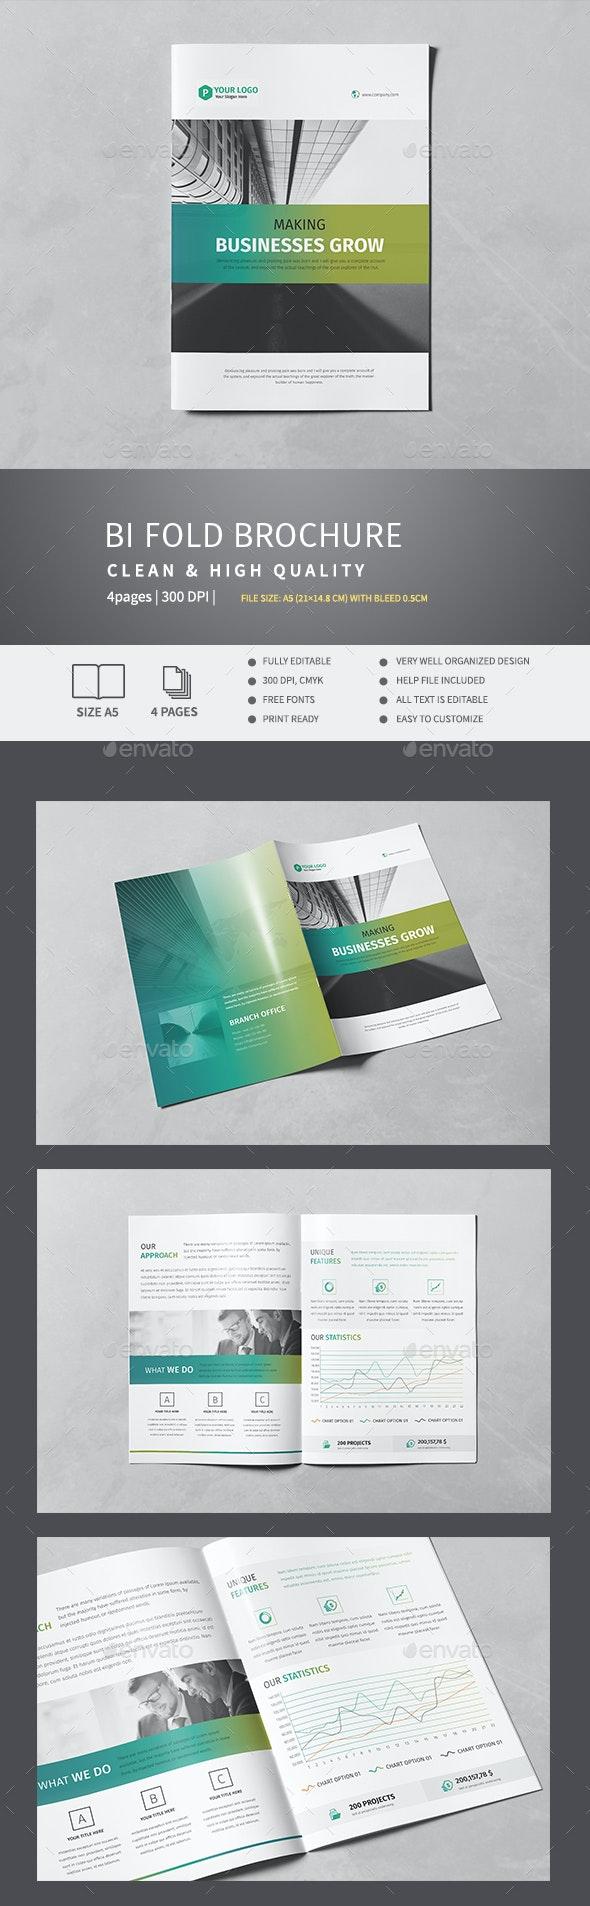 Corporate Bi-Fold Brochure v.2 - Corporate Brochures